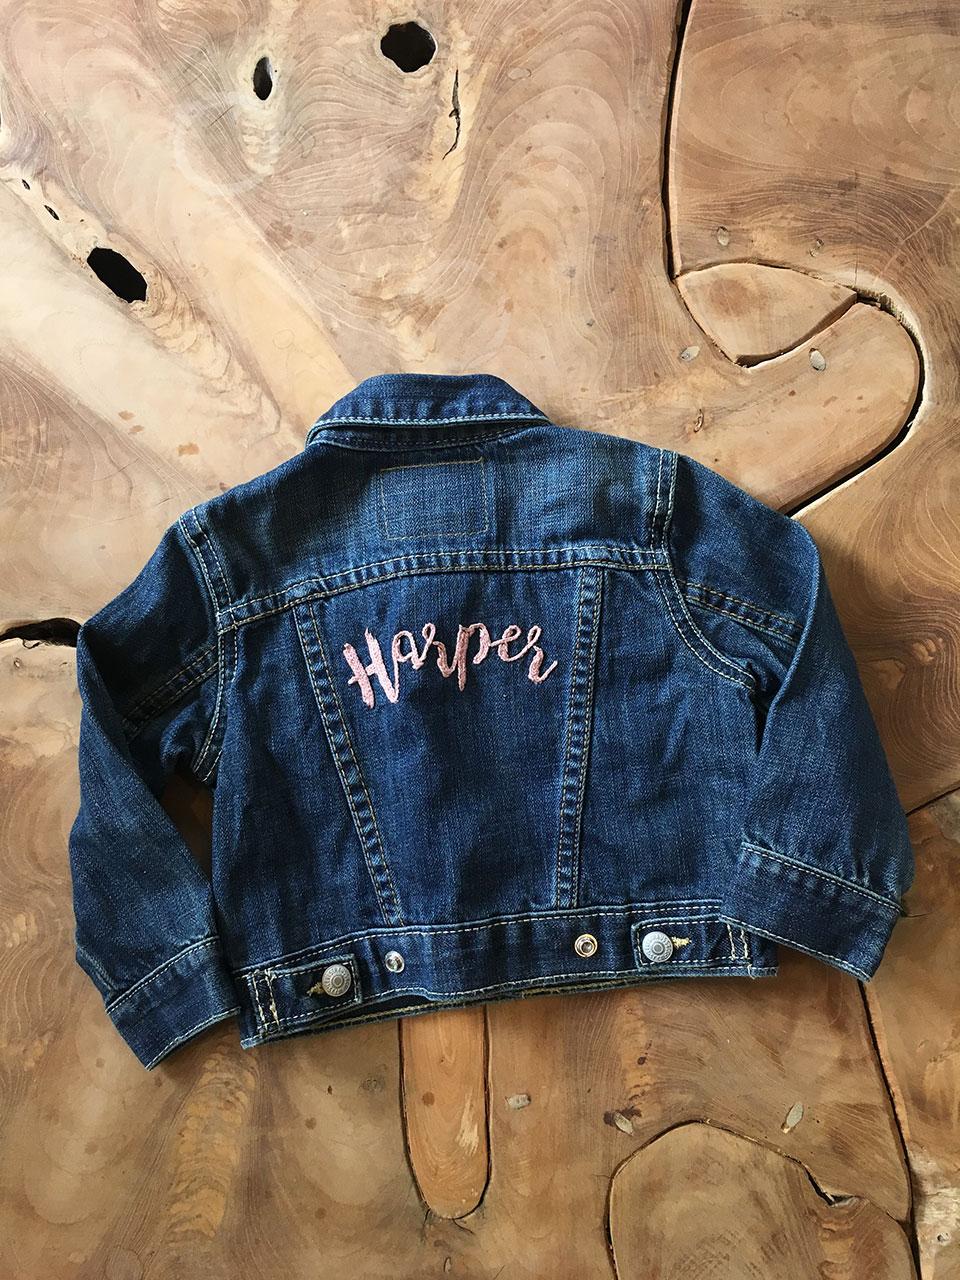 Harper-Jacket.jpg